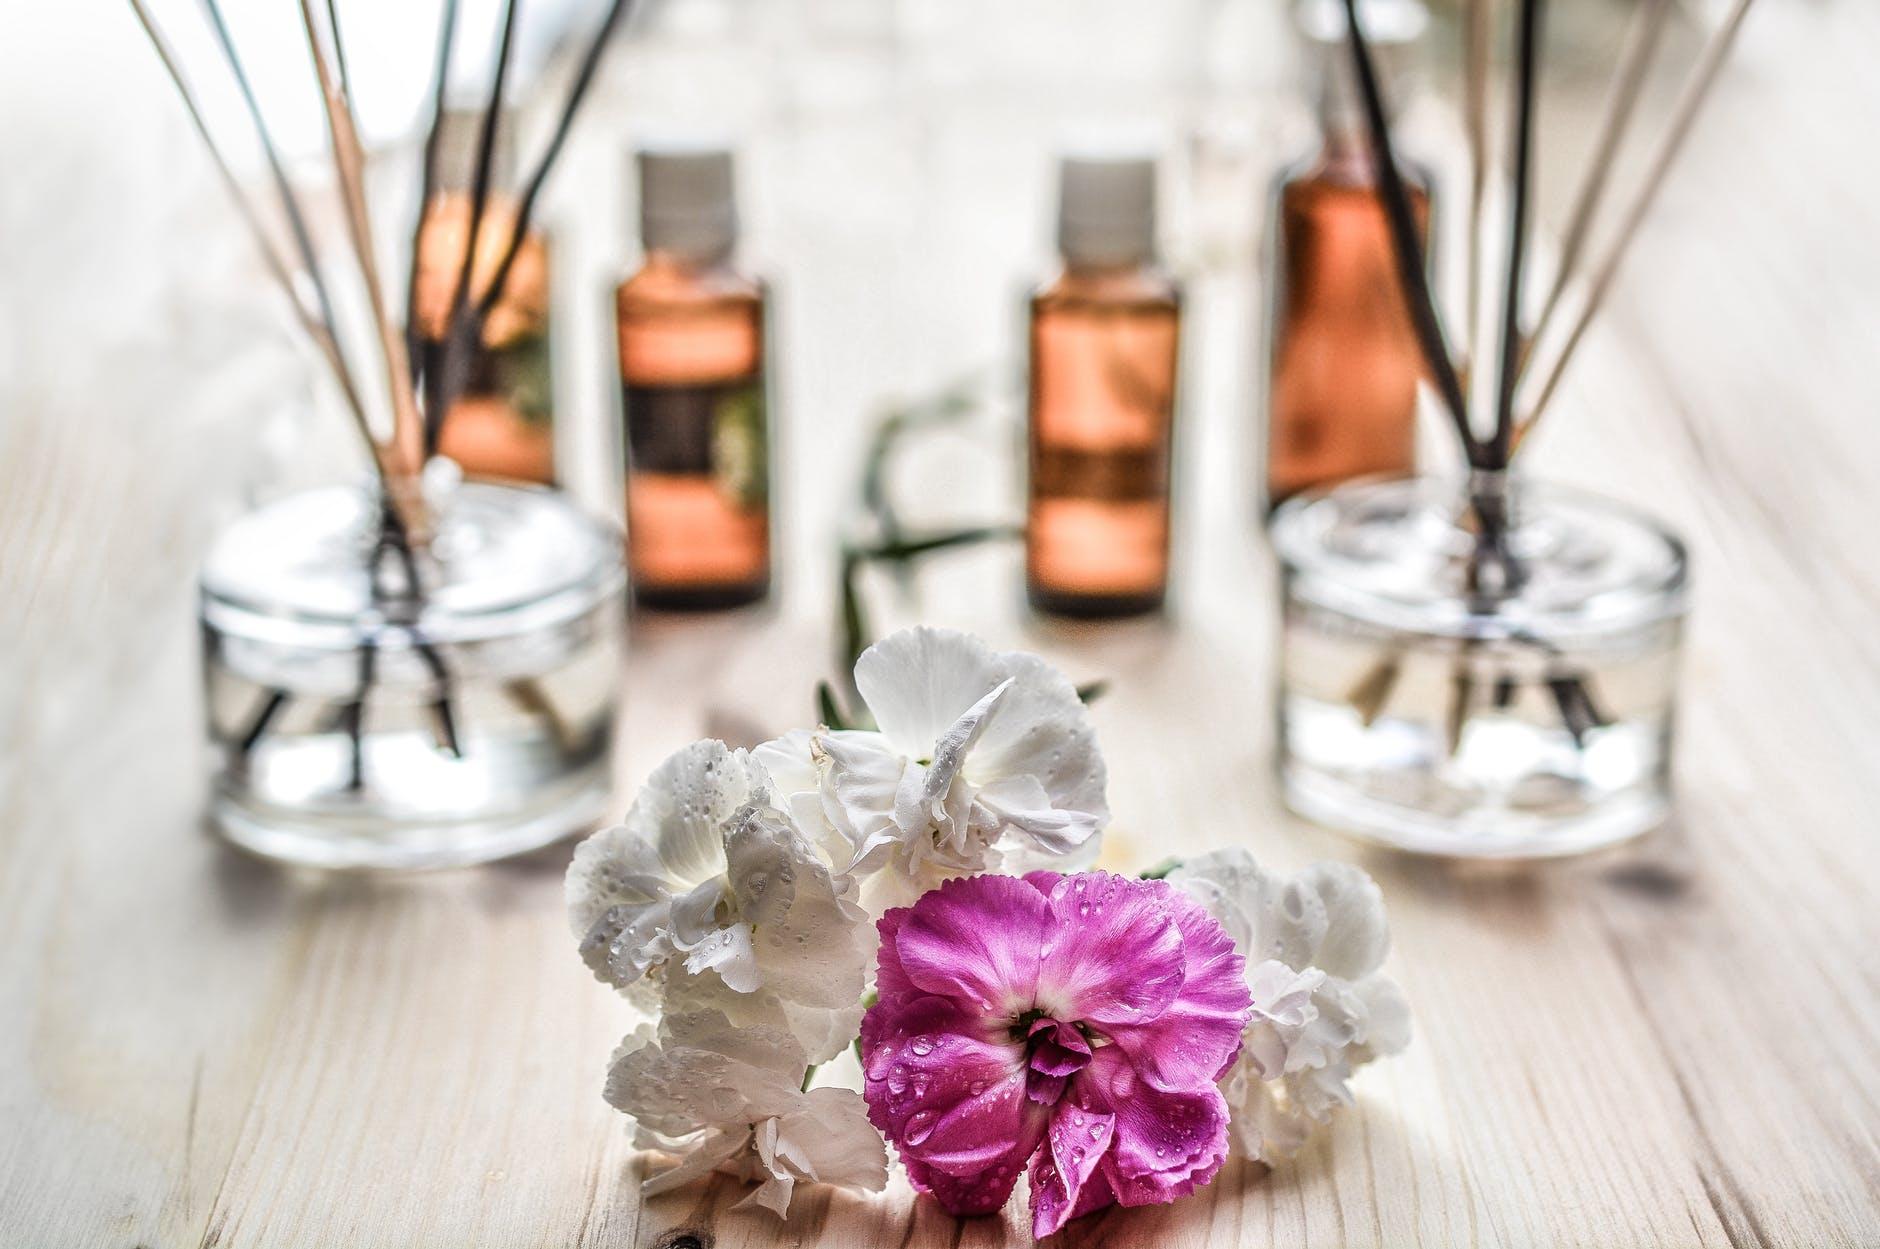 aromaterapia espaço terapêutico